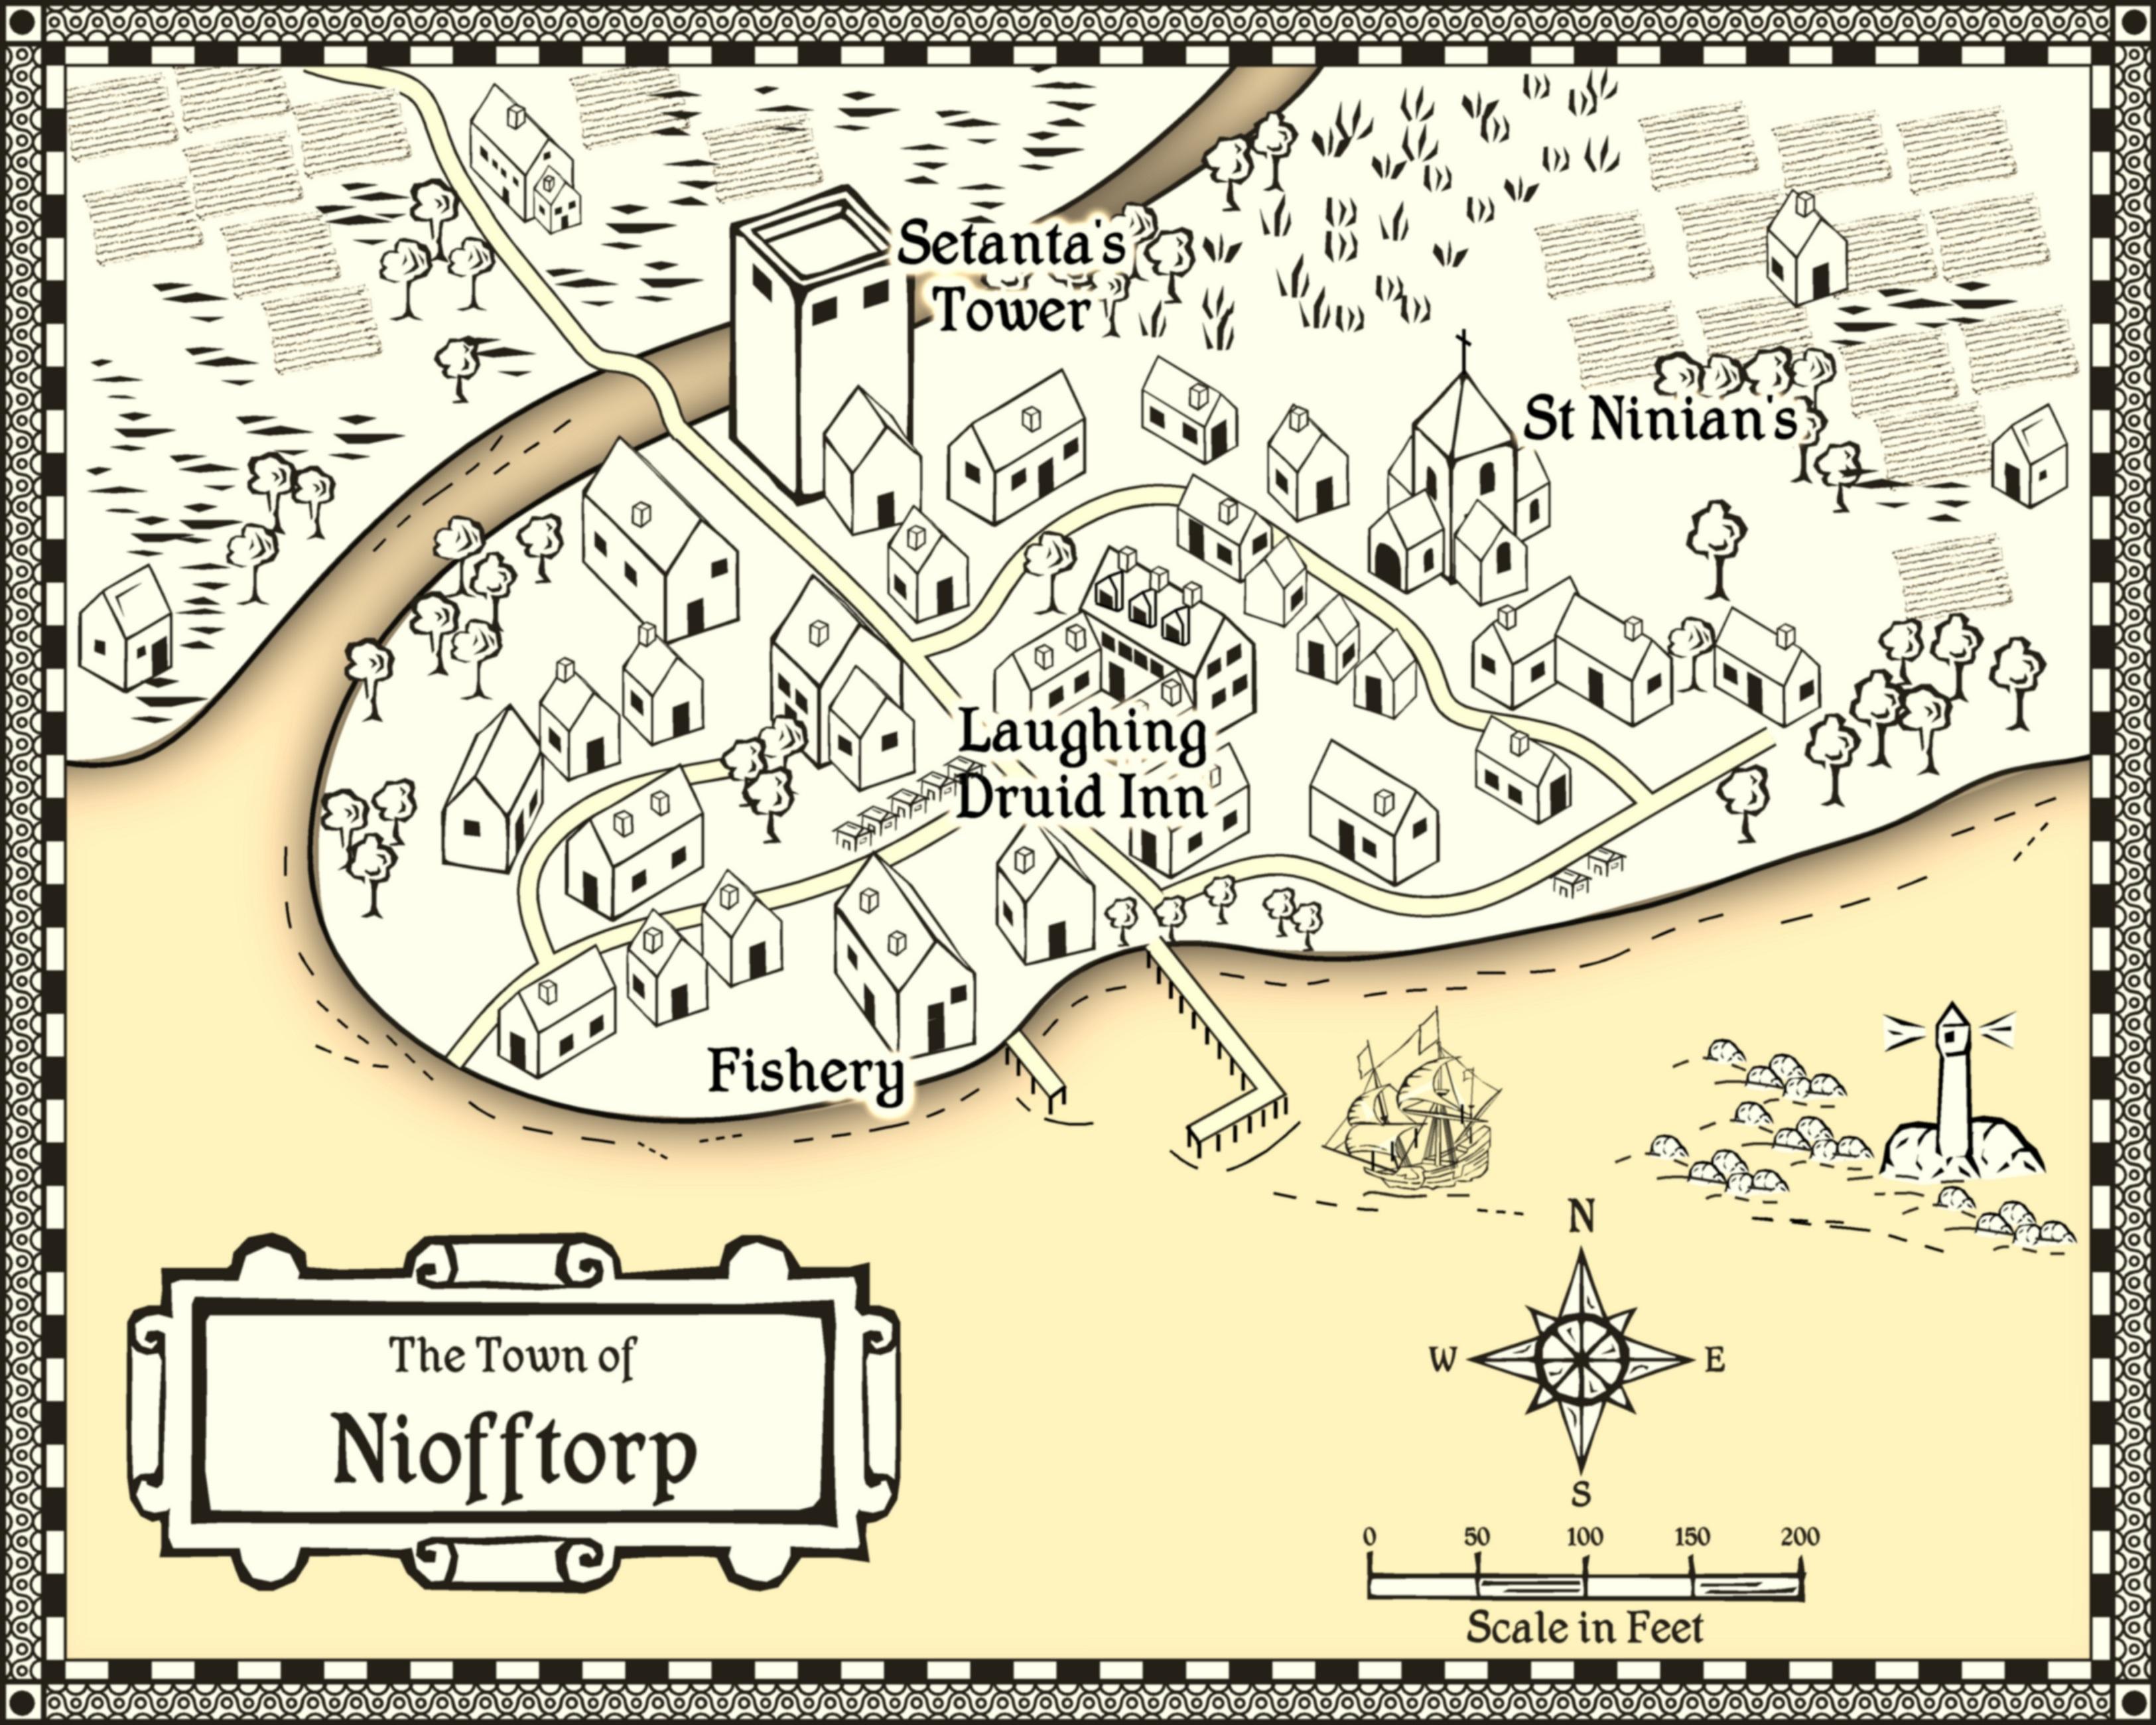 Niofftorp.JPG